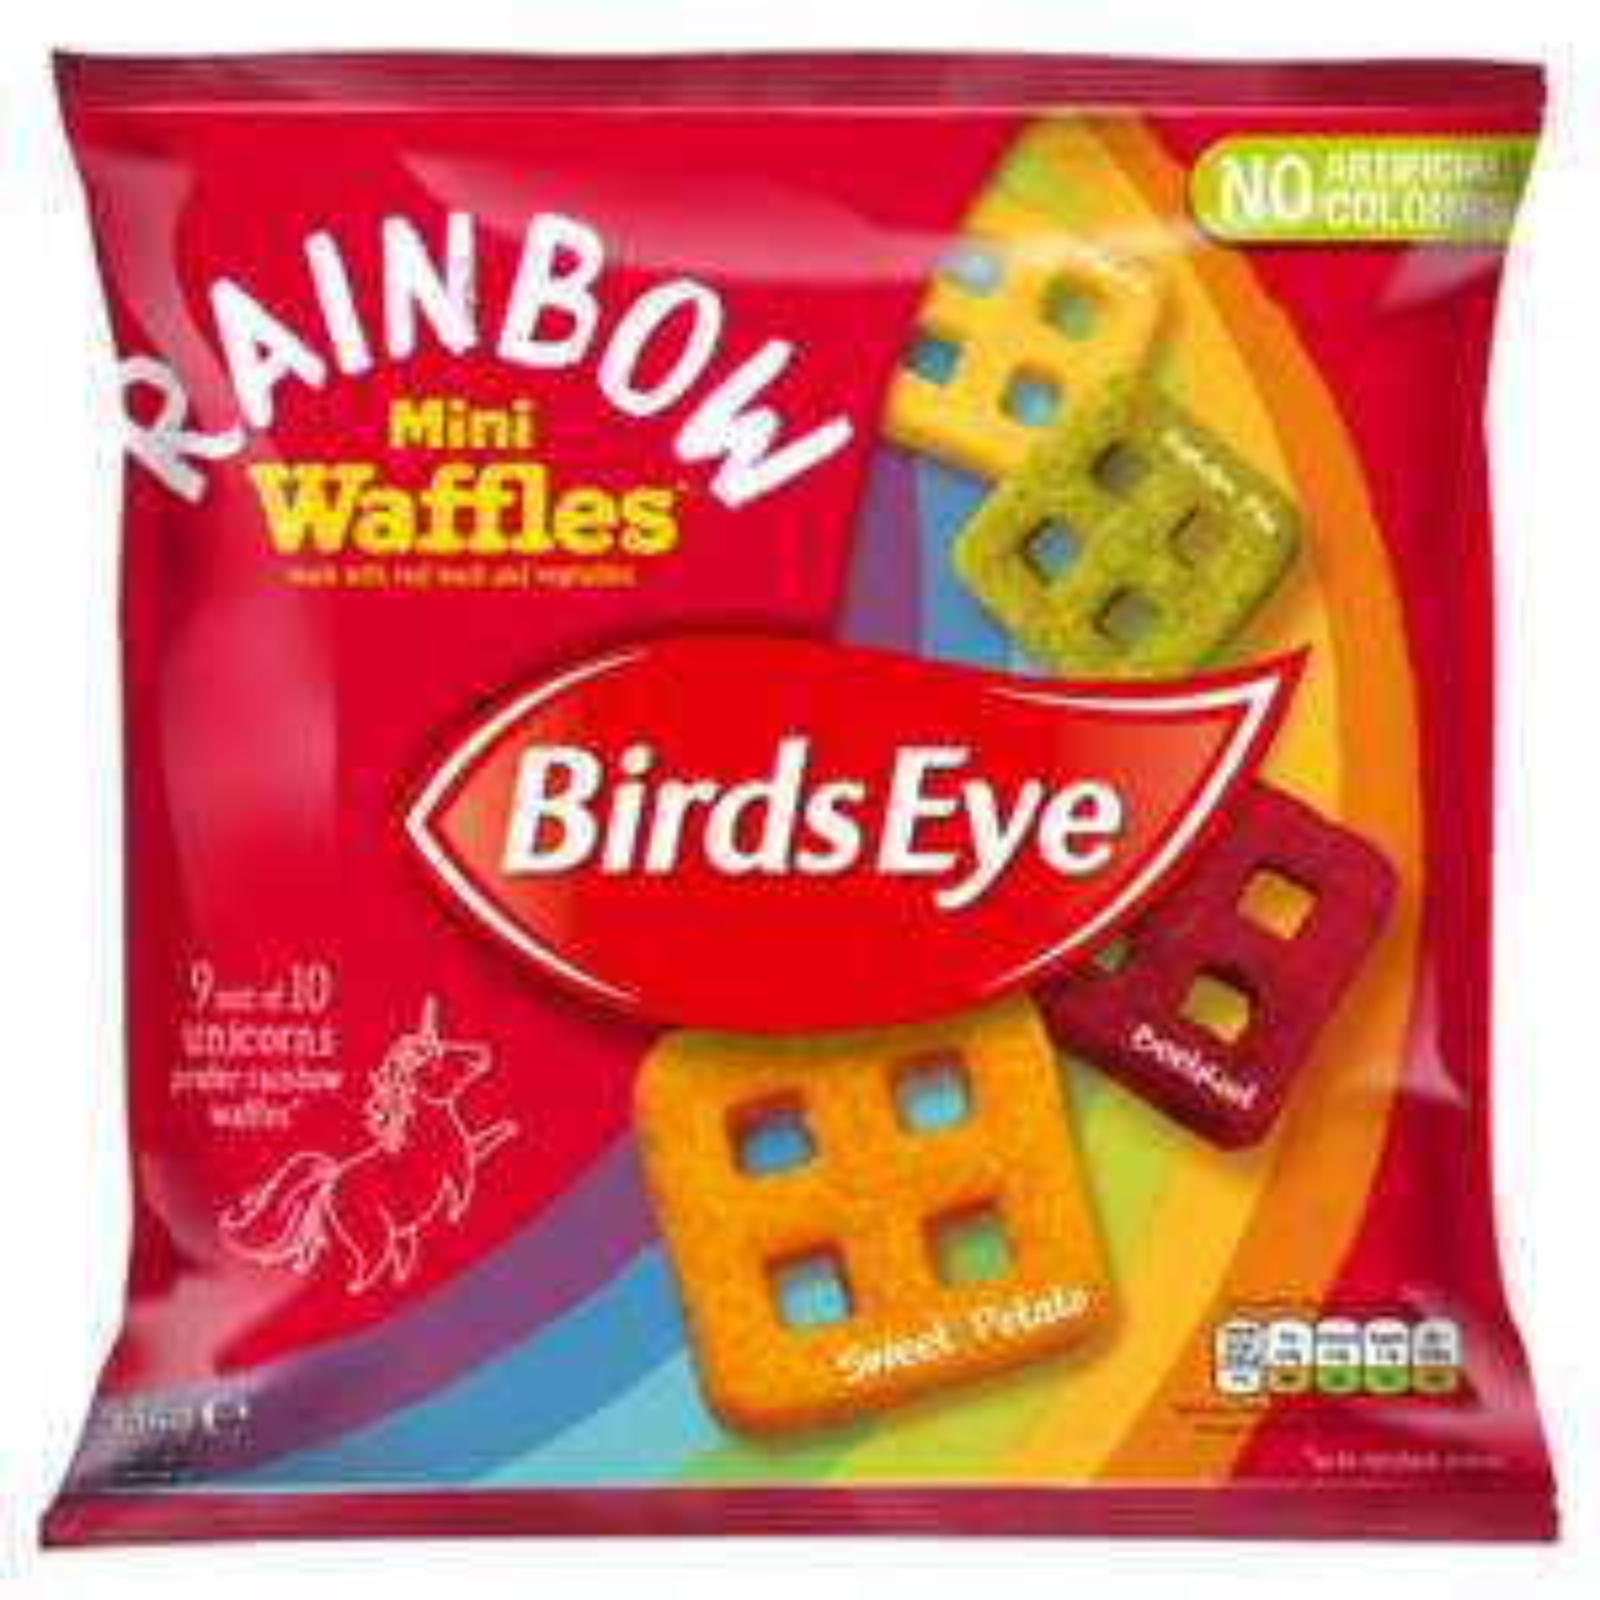 534G BIRDS EYE Rainbow Waffles 99p at Farmfoods Sutton